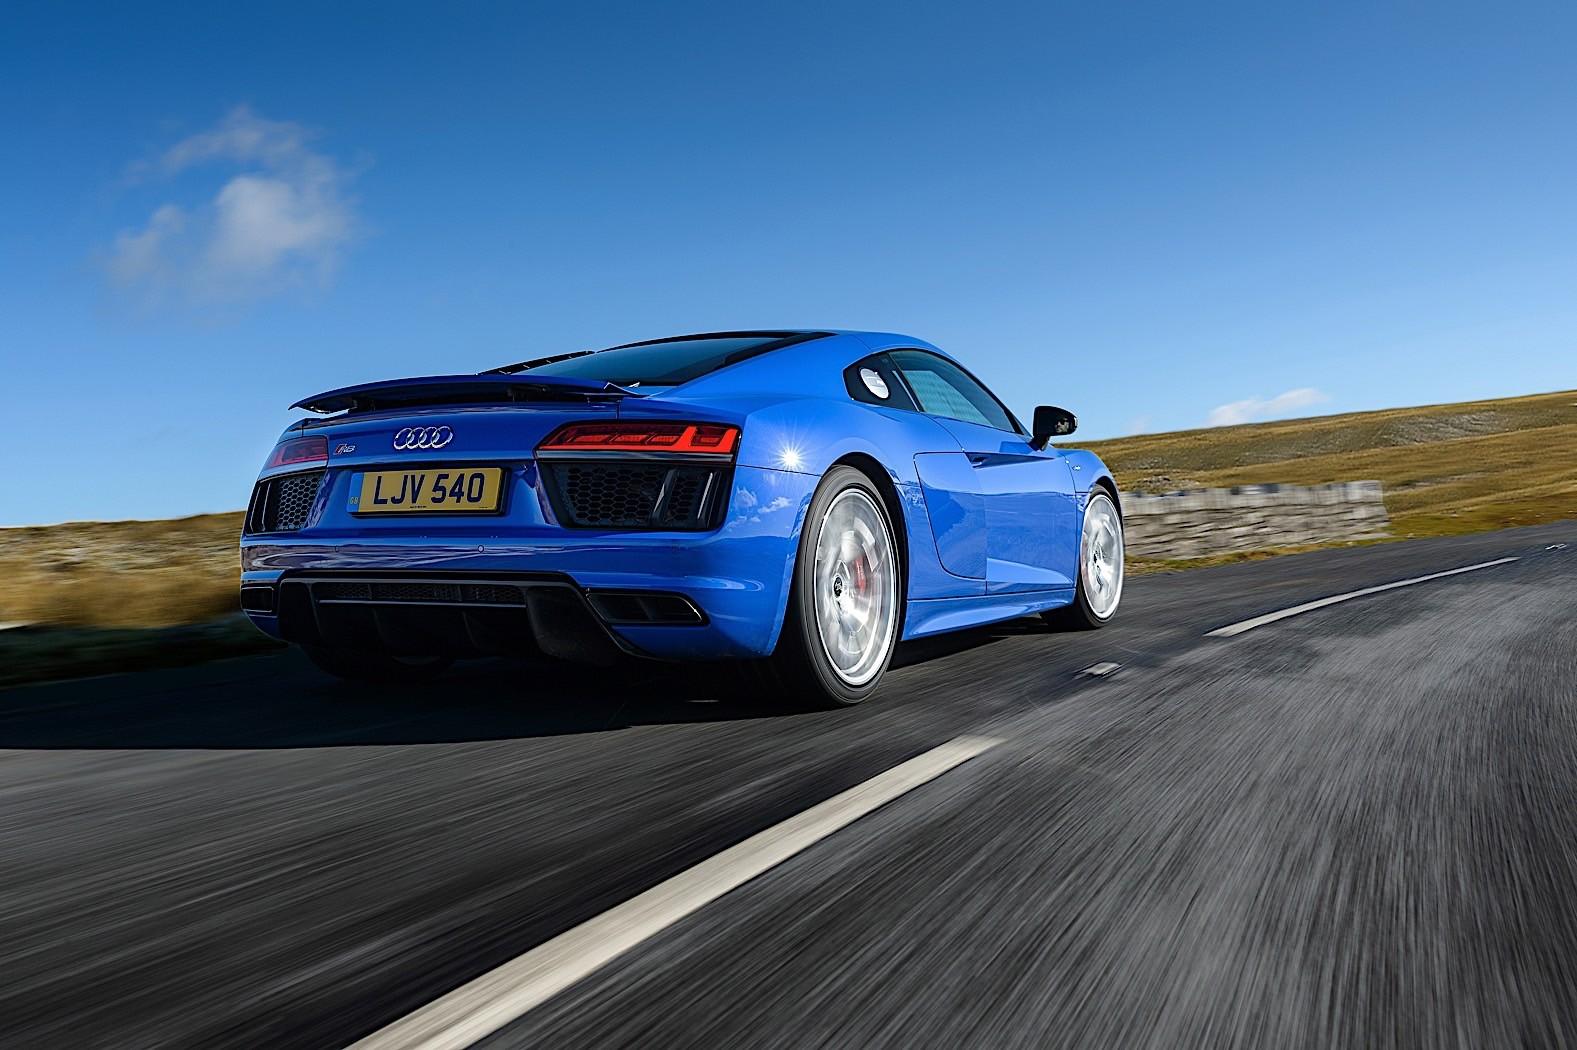 Audi R8 Limited Rear Wheel Series Released in UK ...